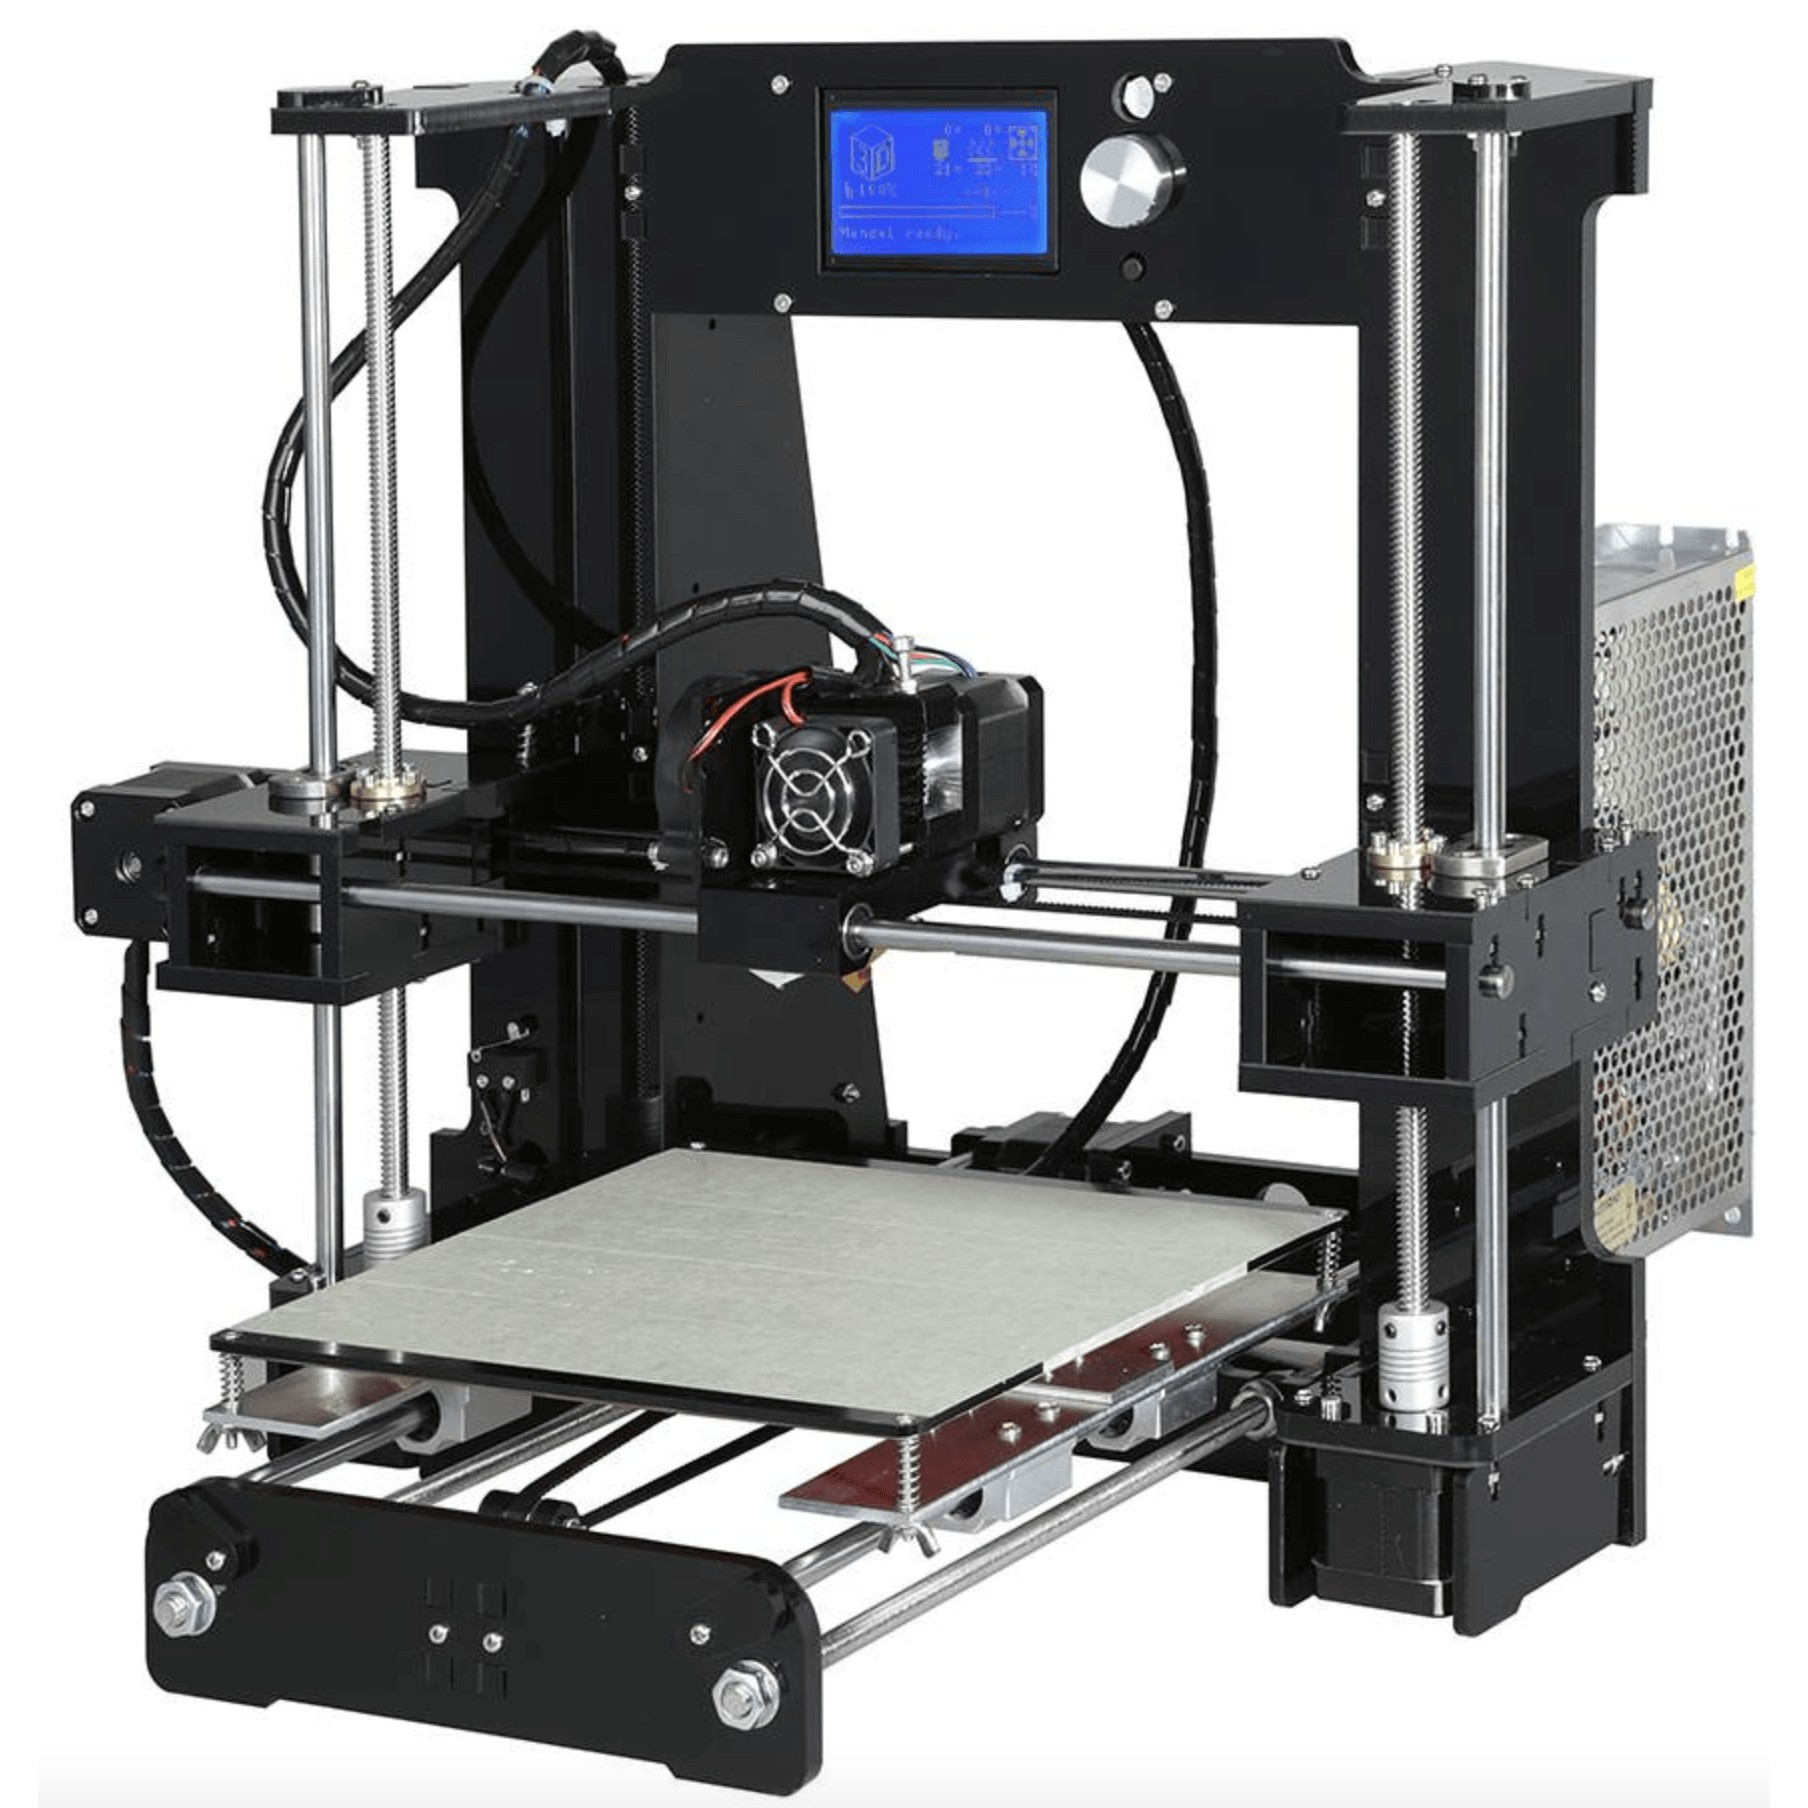 Net A6 3D printer Kit high precision printer